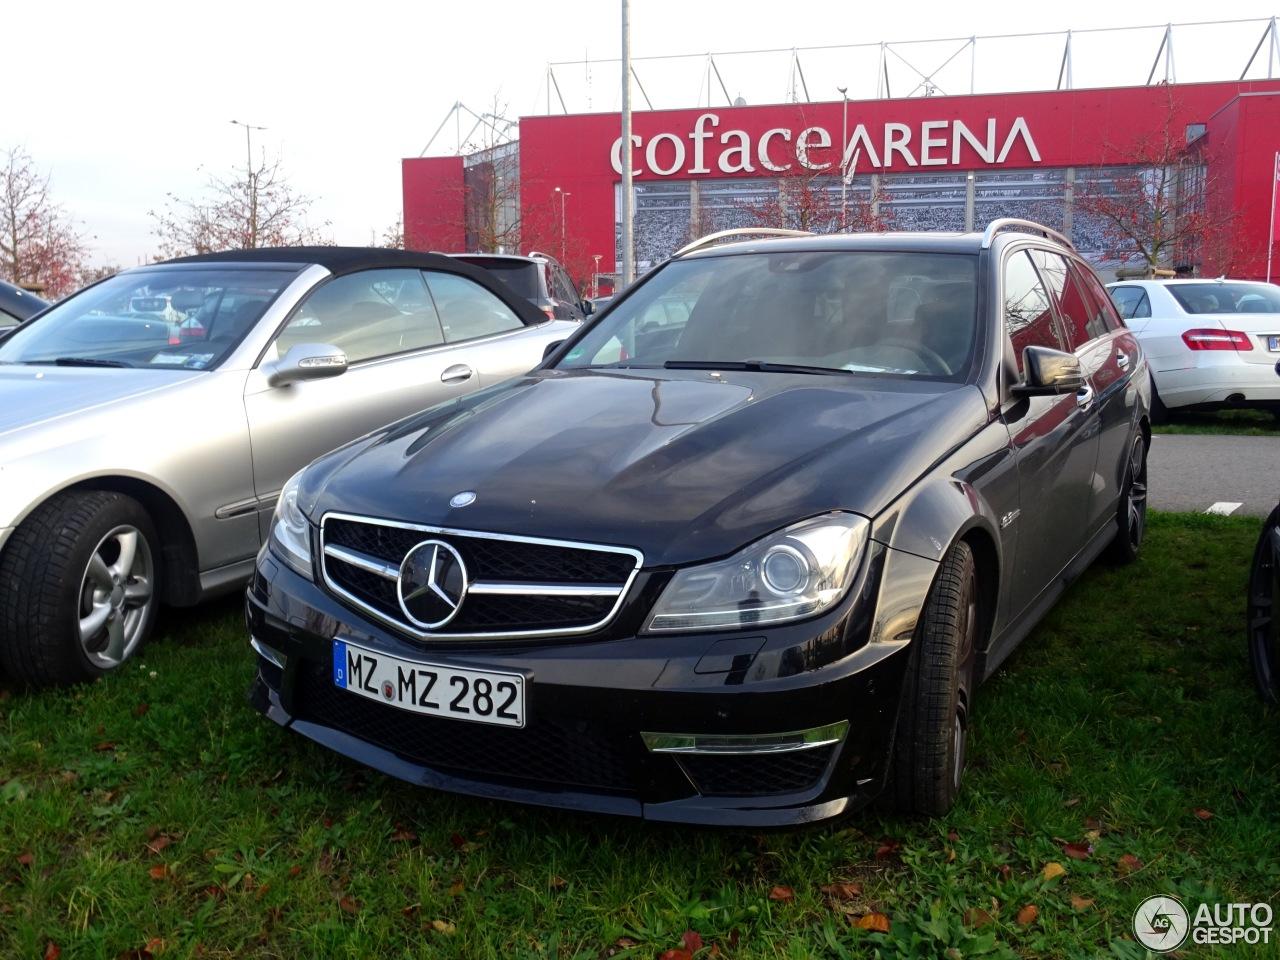 Mercedes-Benz C 63 AMG Estate 2012 4